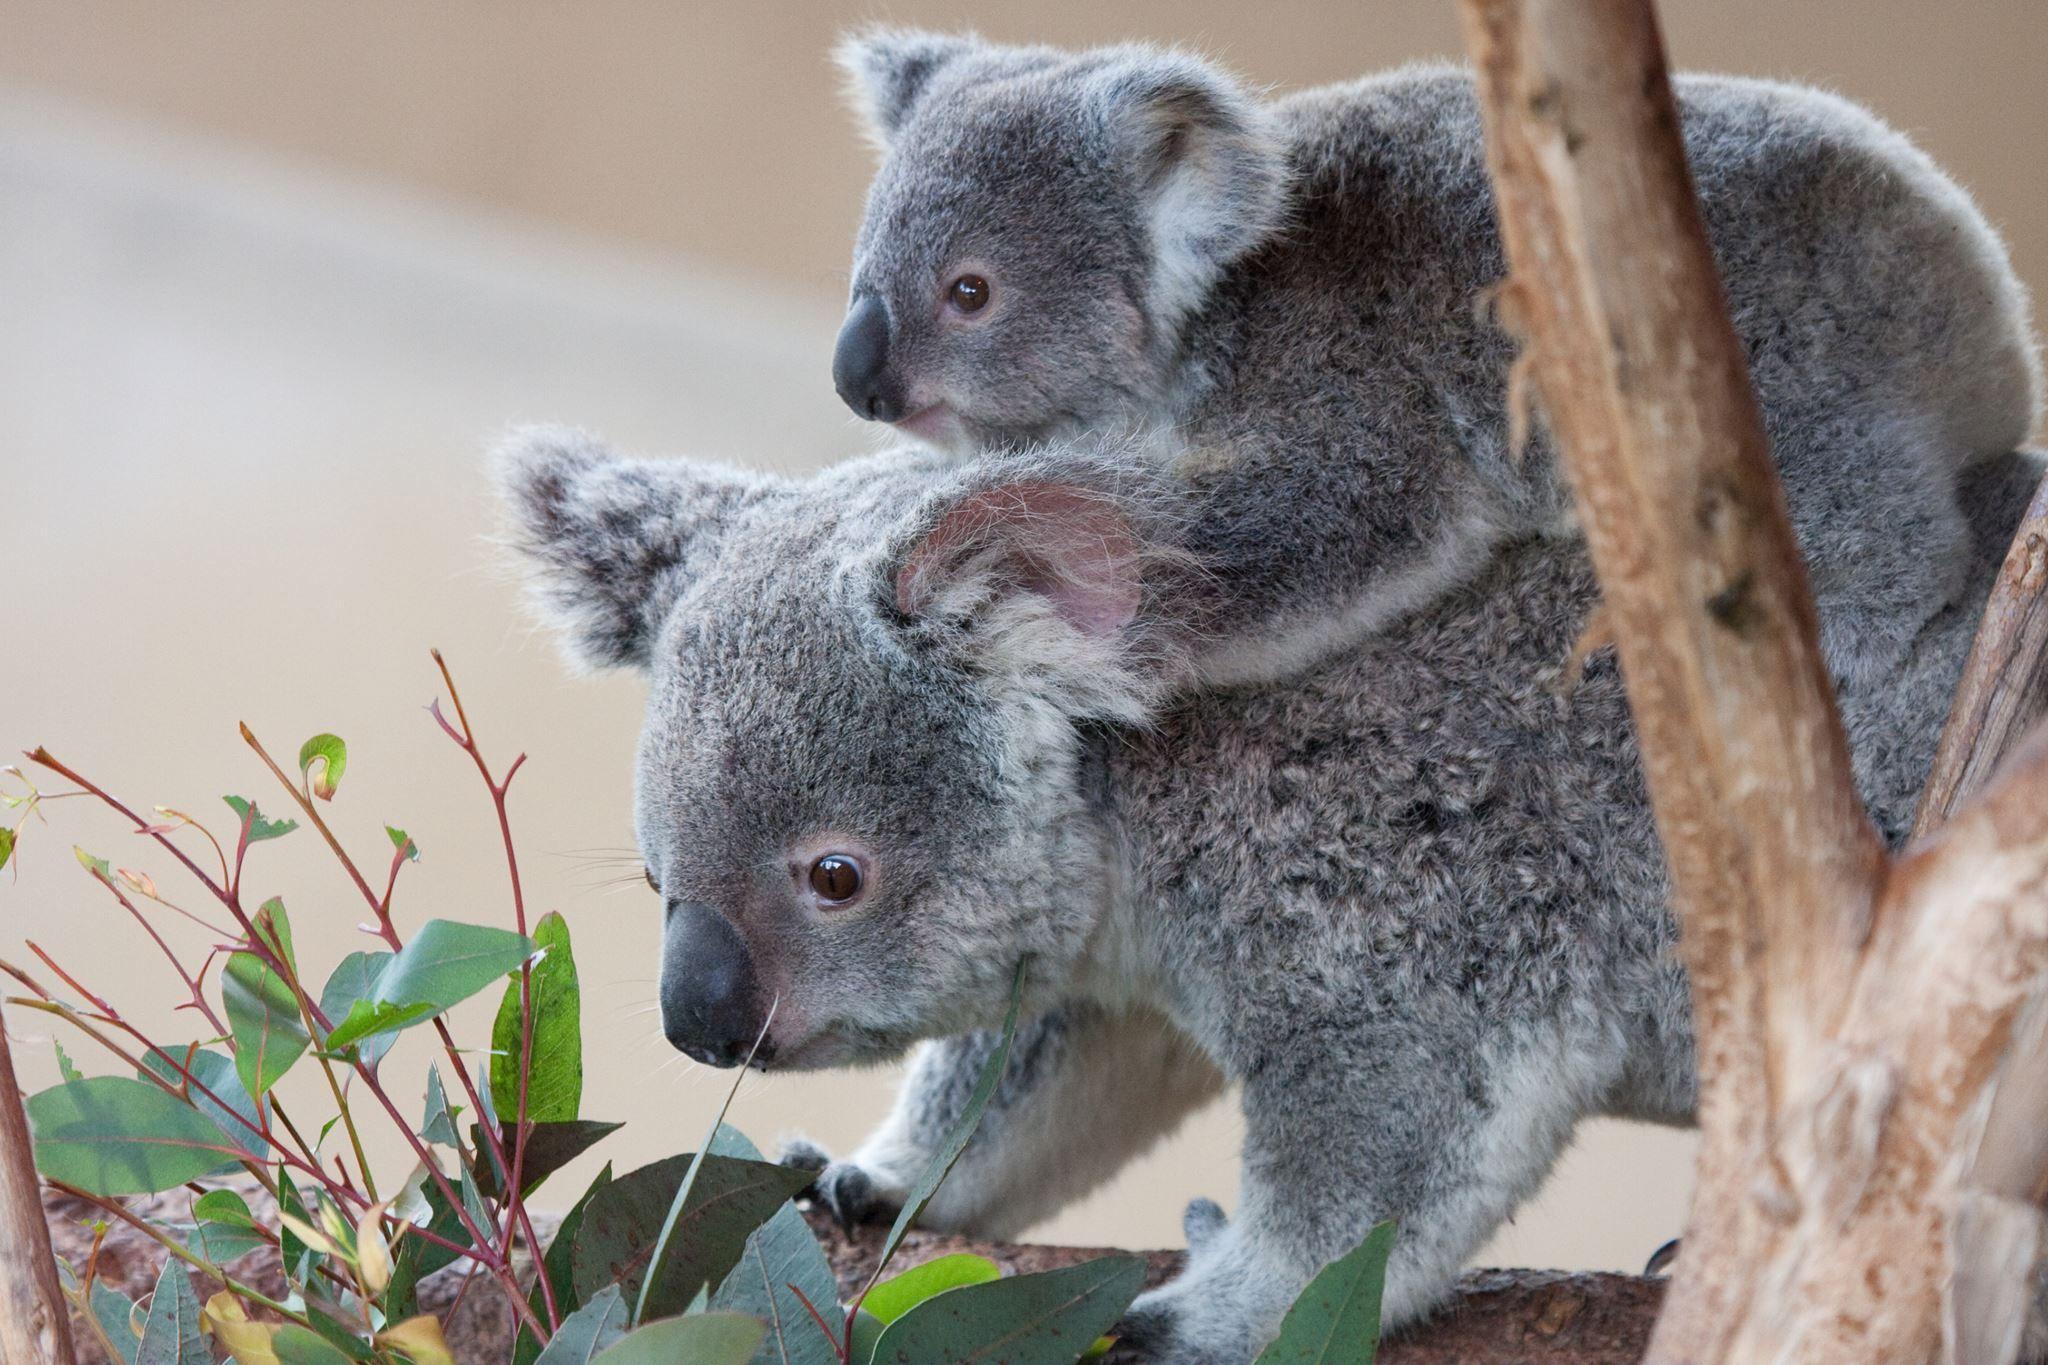 Mum baby koala australian koalas pinterest - Pics of baby koalas ...